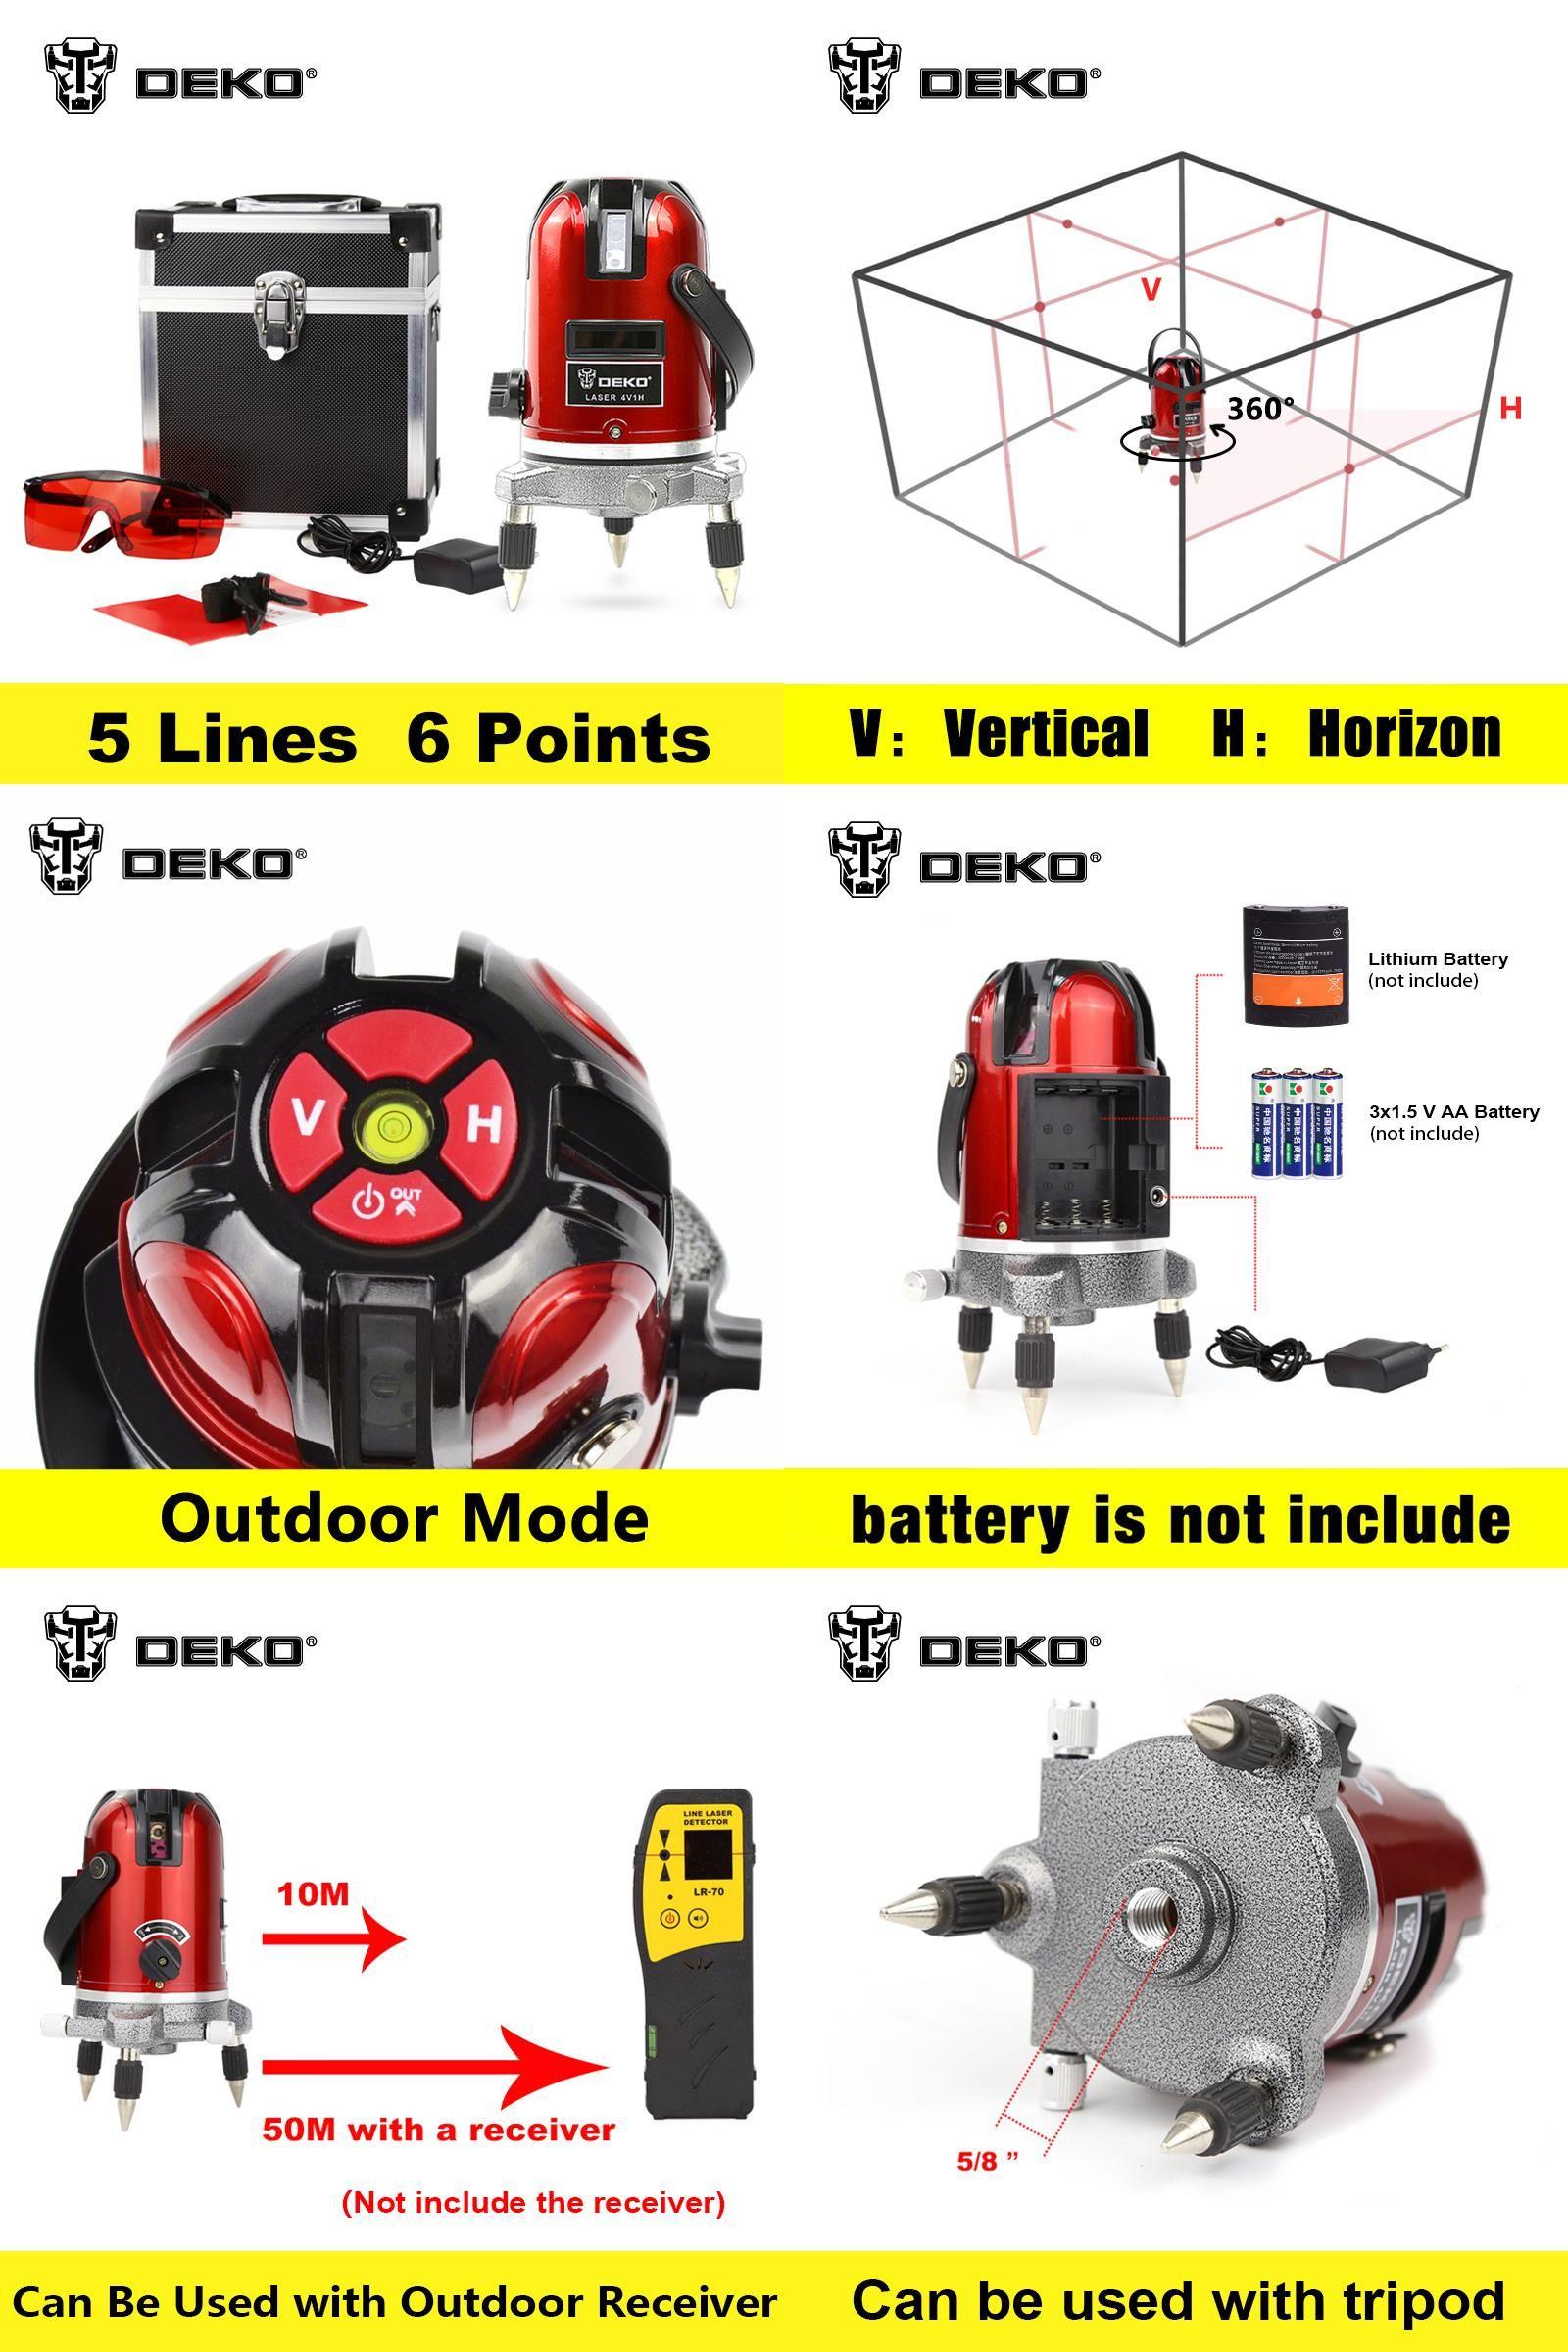 Visit To Buy Dekopro 5 Lines 6 Points Laser Level 360 Vertical Horizontal Rotary Cross Laser Line Leveling Can Be Used W Laser Levels Vertical Line Level